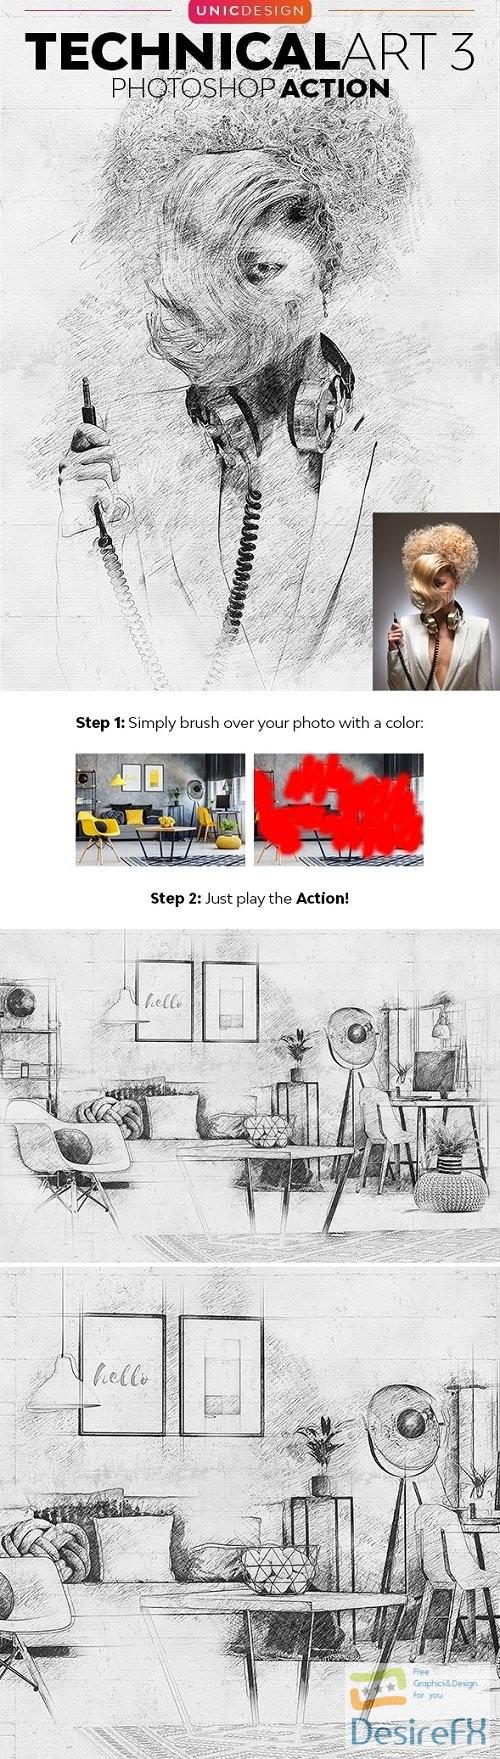 actions-atn - TechnicalArt 3 Photoshop Action 24222422